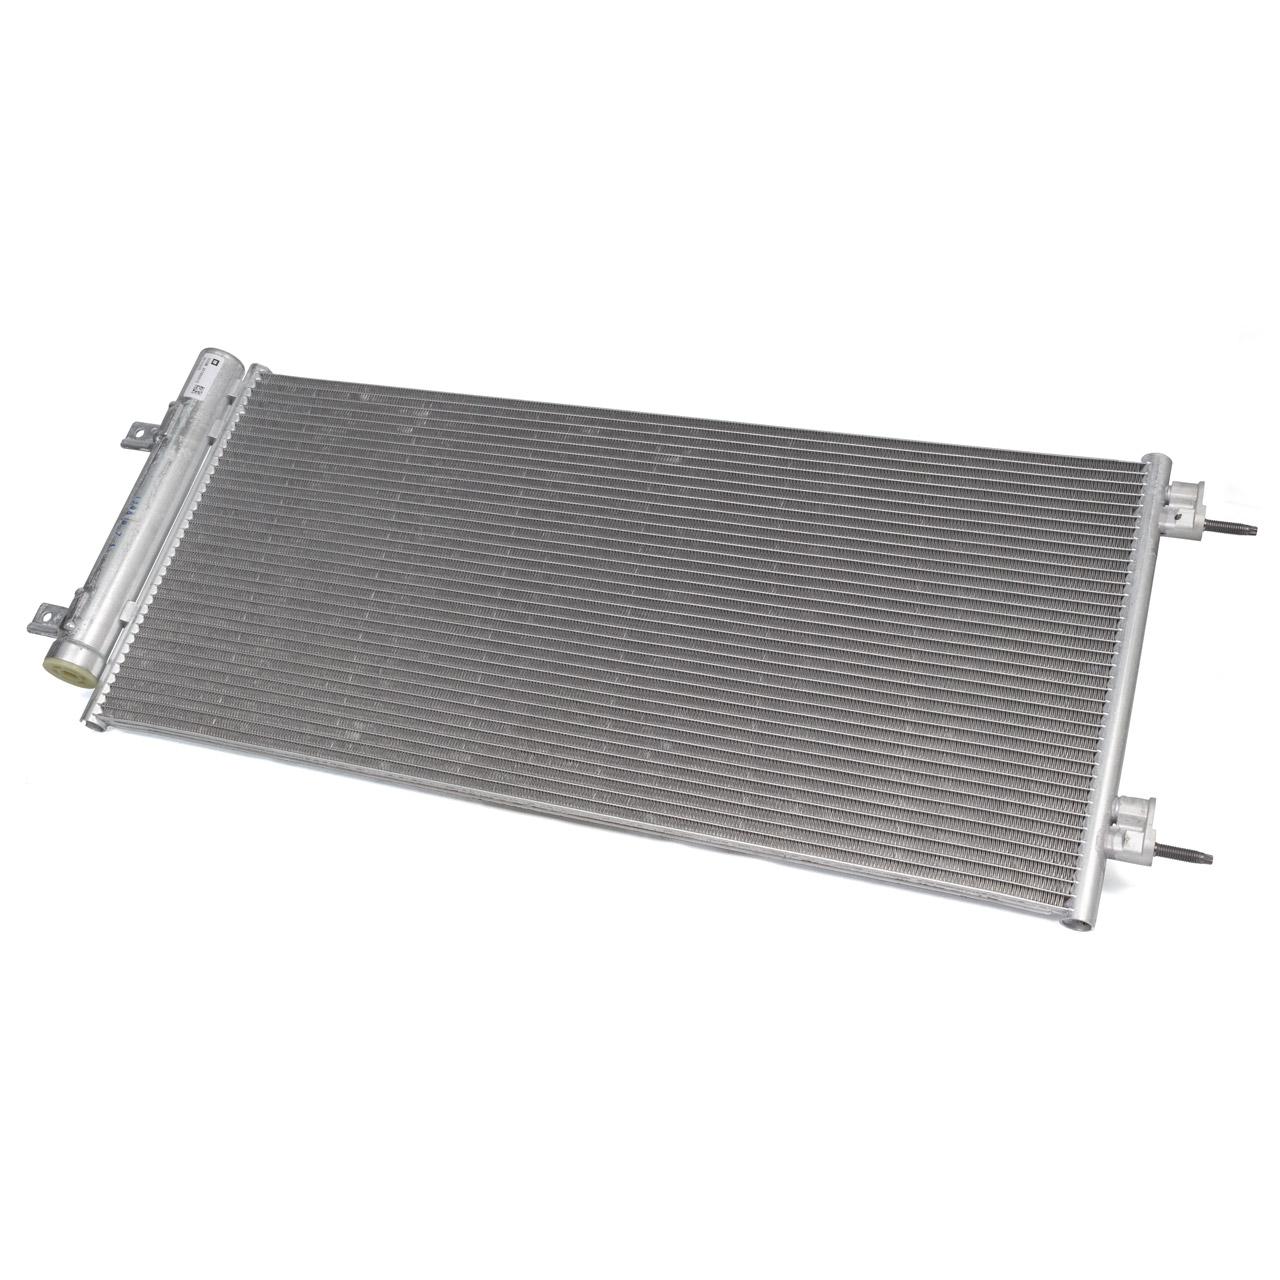 Kondensator Klimakondensator OPEL Astra K + Sports Tourer (B16) 39131676